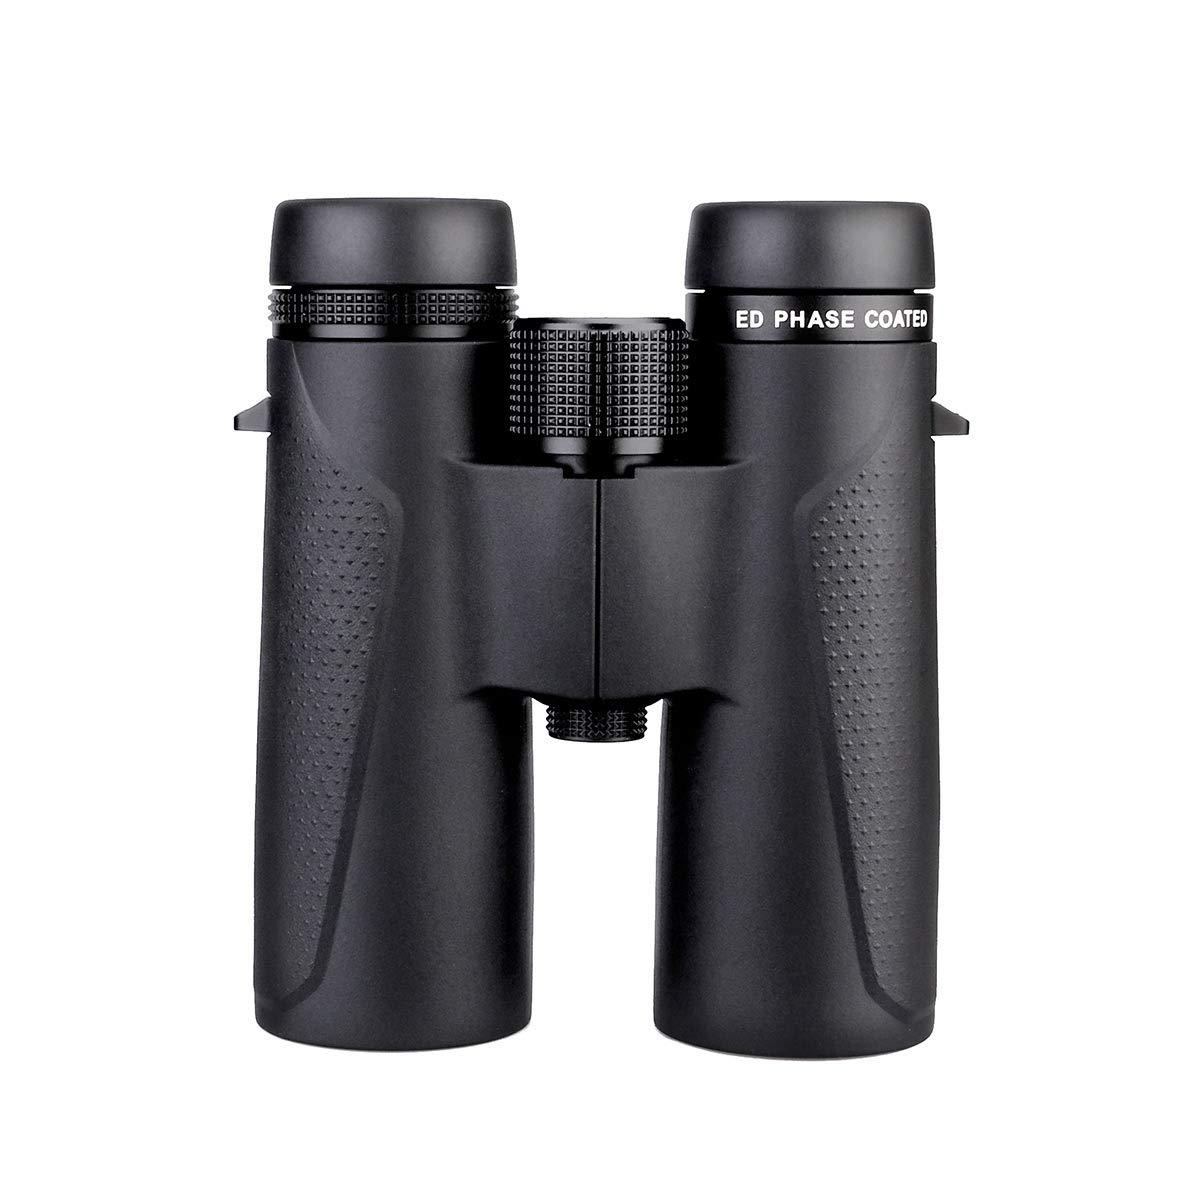 Svbony SV202 Prismaticos Profesionales 10x42 Vidrio ED Visi/ón Ultra Clara Binoculars Impermeable Anti-Diente Prismaticos FMC BAK-4 Prism para la observaci/ón de Aves Caza